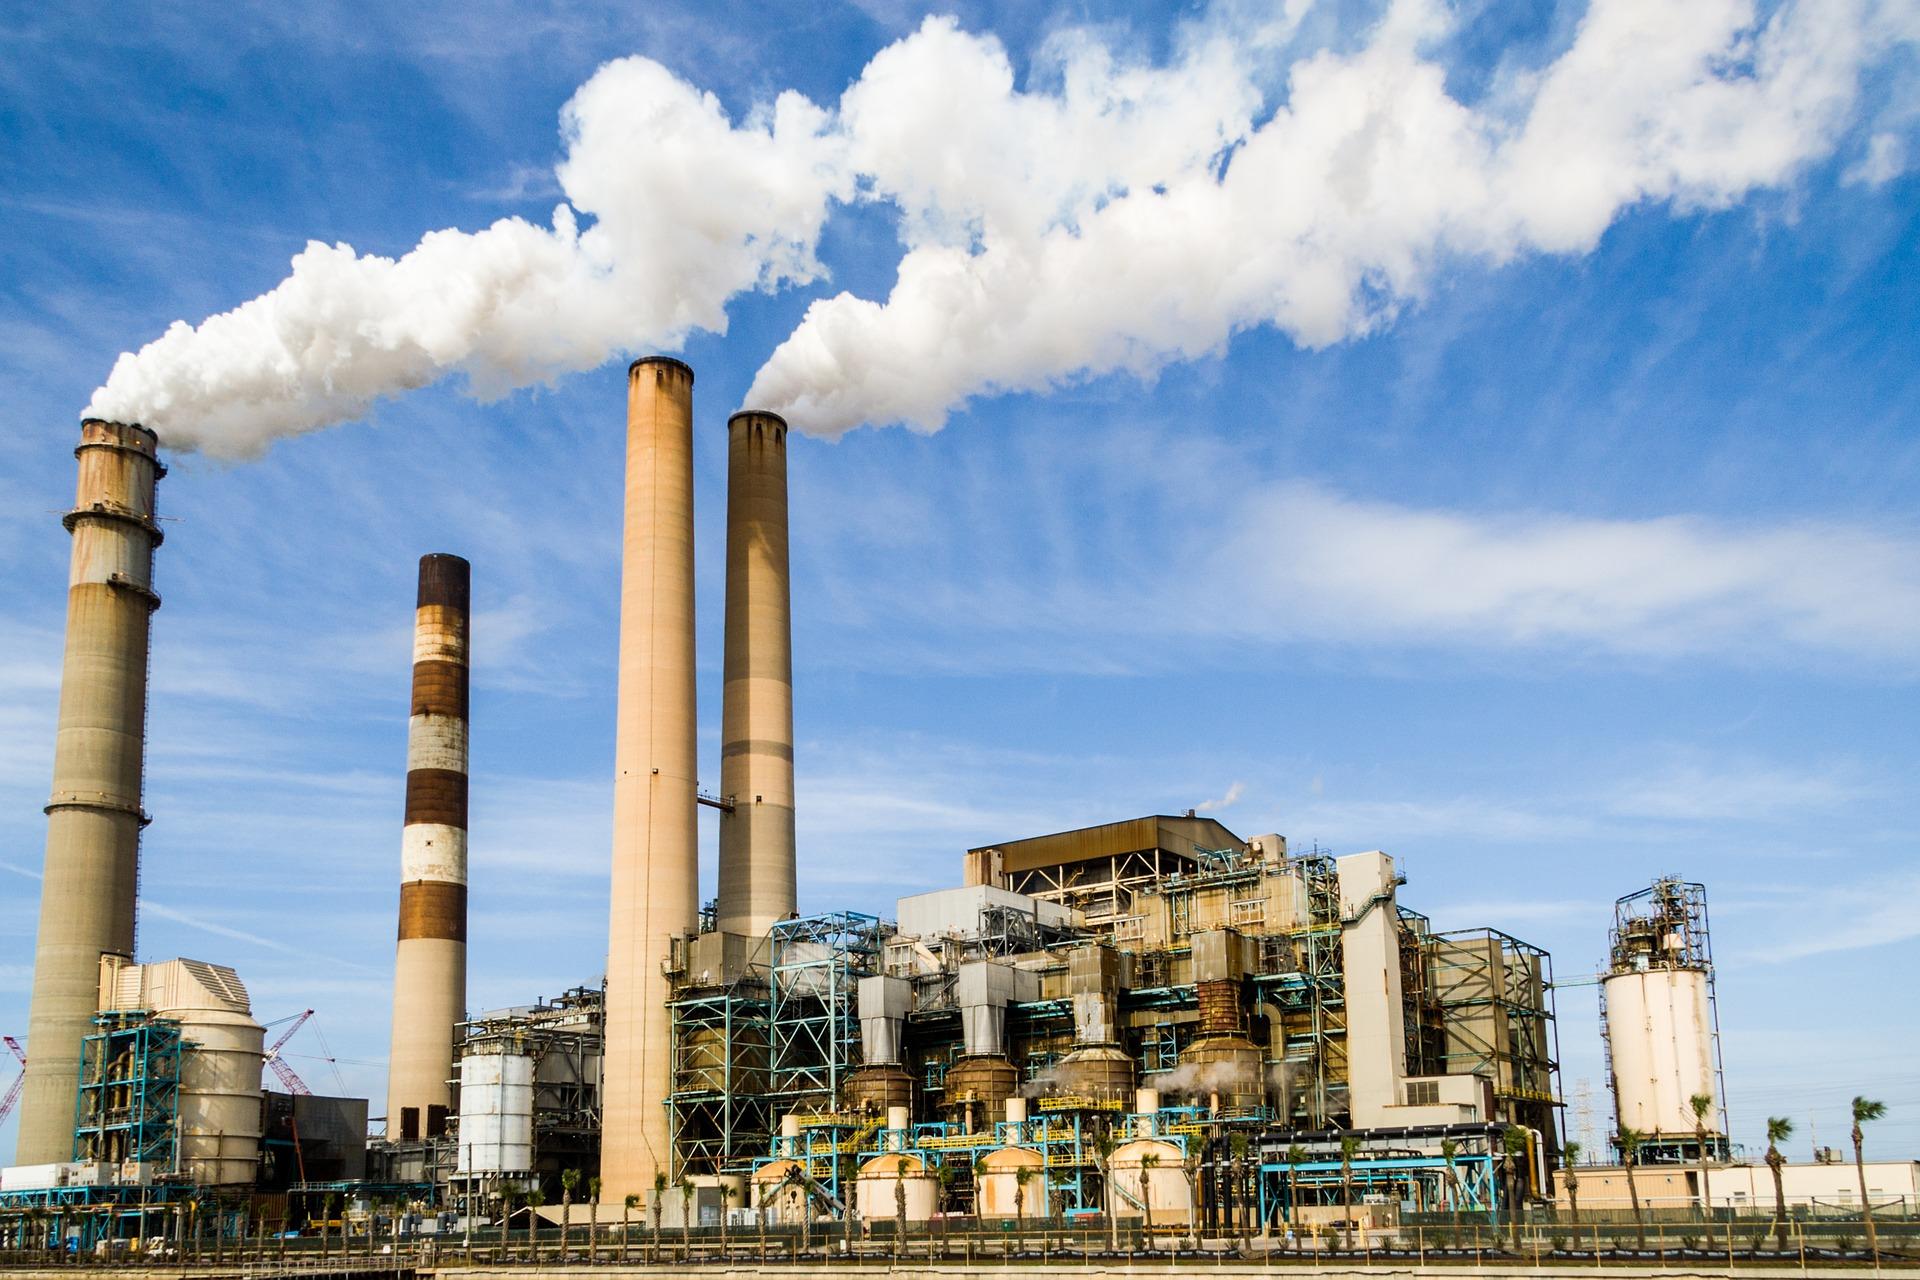 Usine_industrie_pollution_sante_environnement